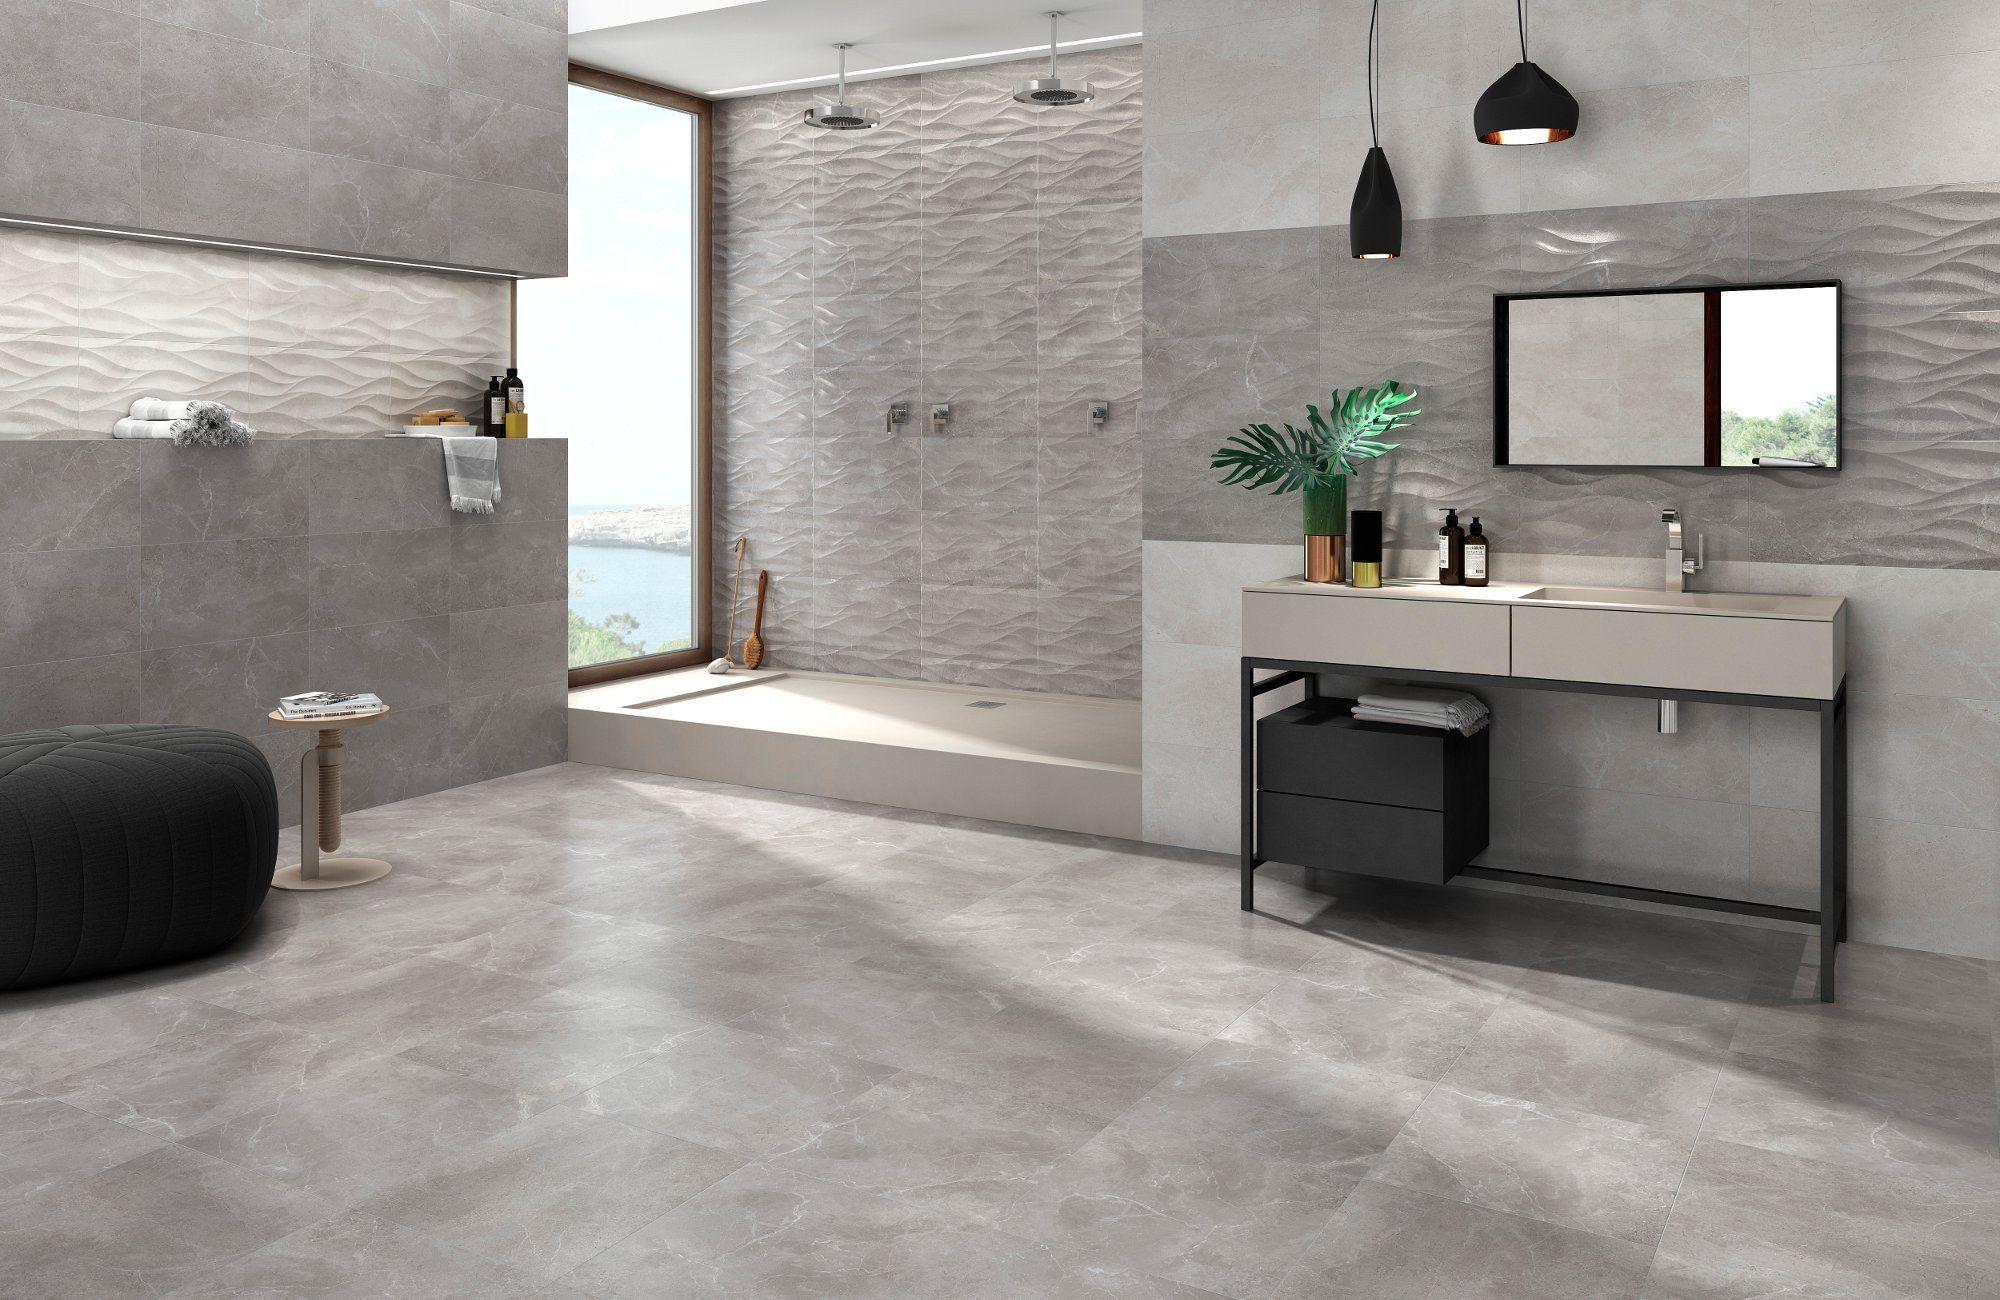 Marble Effect Matt Grey Floor Tile Grey Wall Tiles Light Grey Walls Grey Flooring